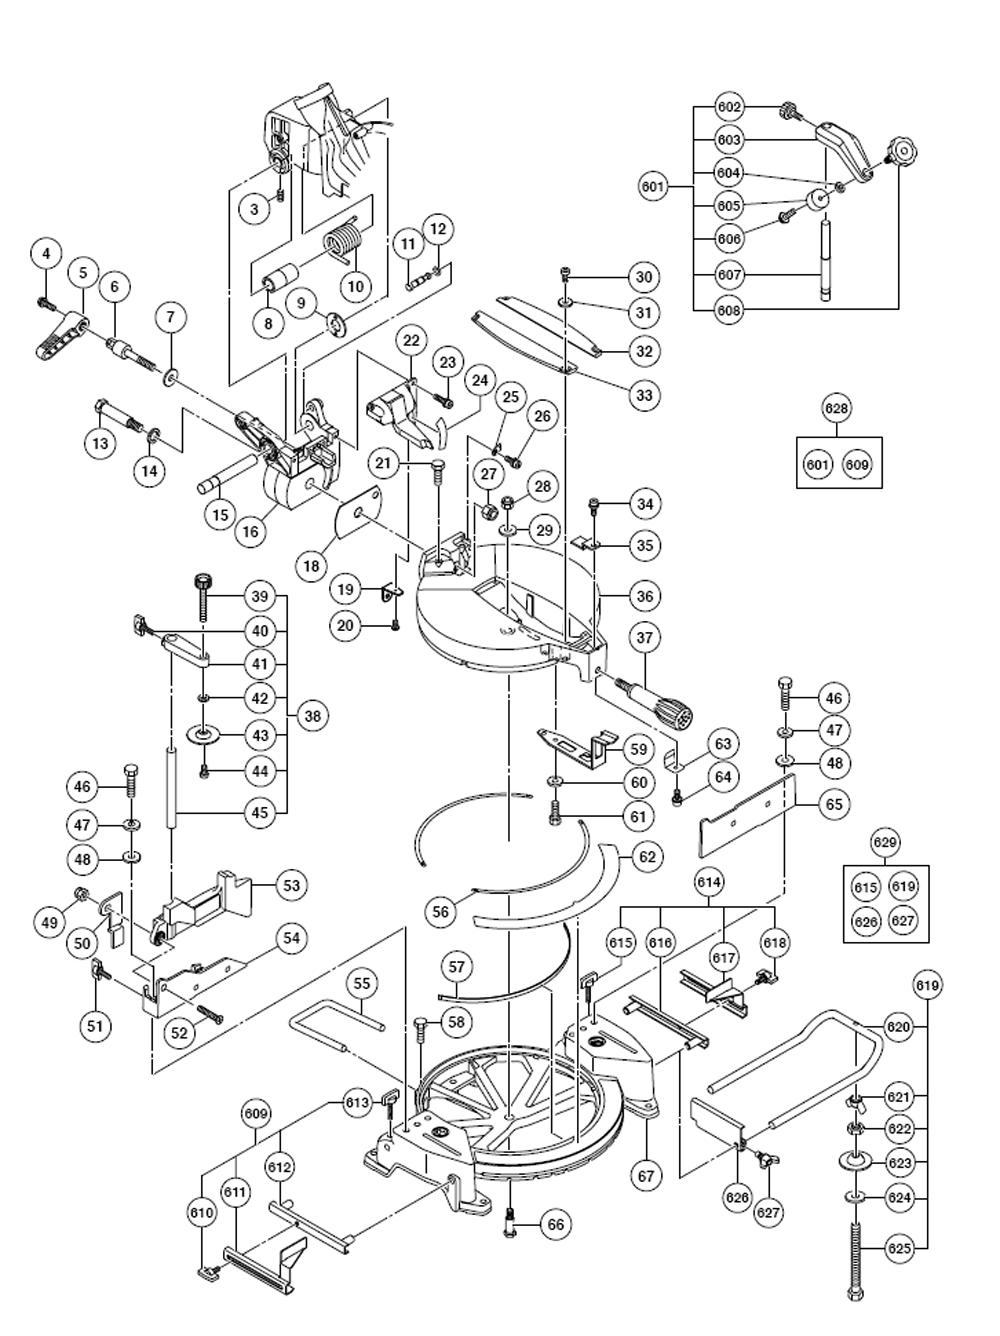 Buy Hitachi C10FCE2 10 Inch Compound Miter Replacement